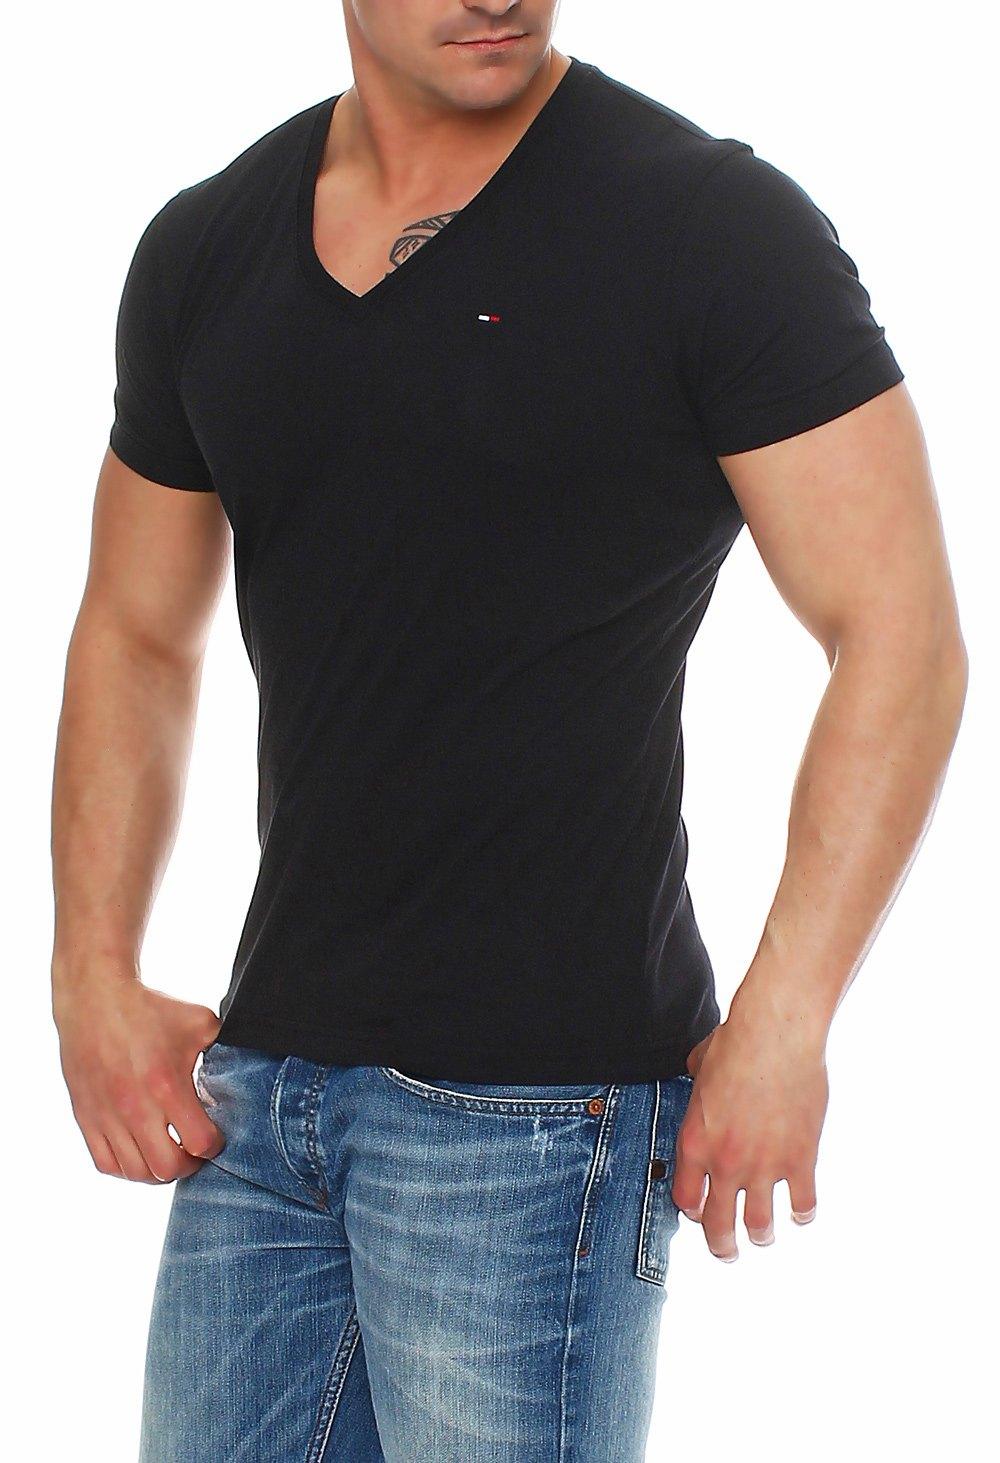 tommy hilfiger denim t shirt shirt v neck tee 1957888835 s m l xl xxl hemd ebay. Black Bedroom Furniture Sets. Home Design Ideas